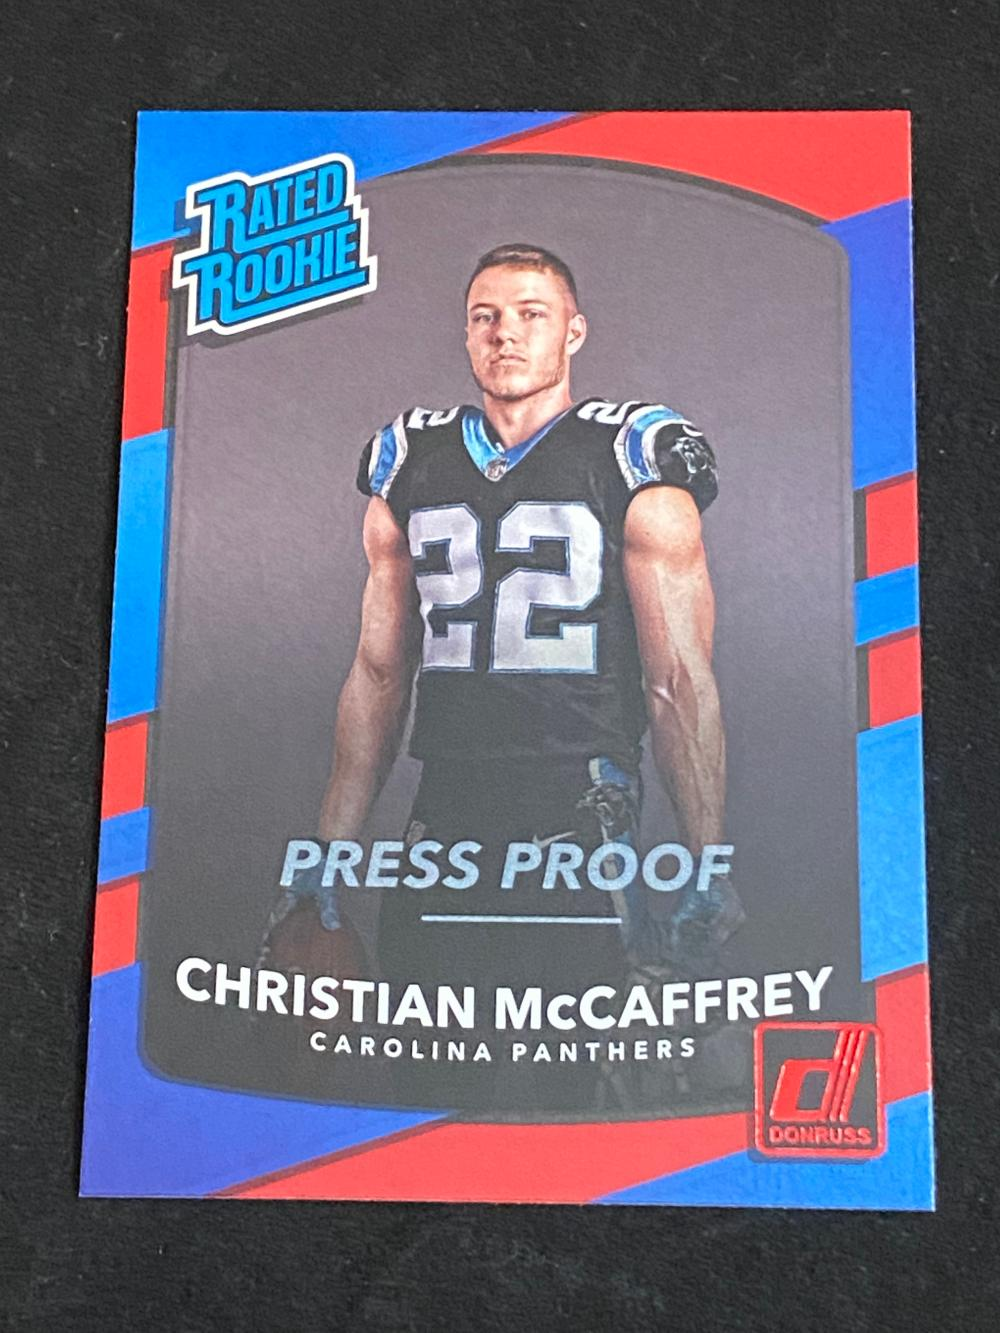 (Mint) 2017 Donruss Red Press Proof Rated Rookie Christian McCaffrey #318 Football Card